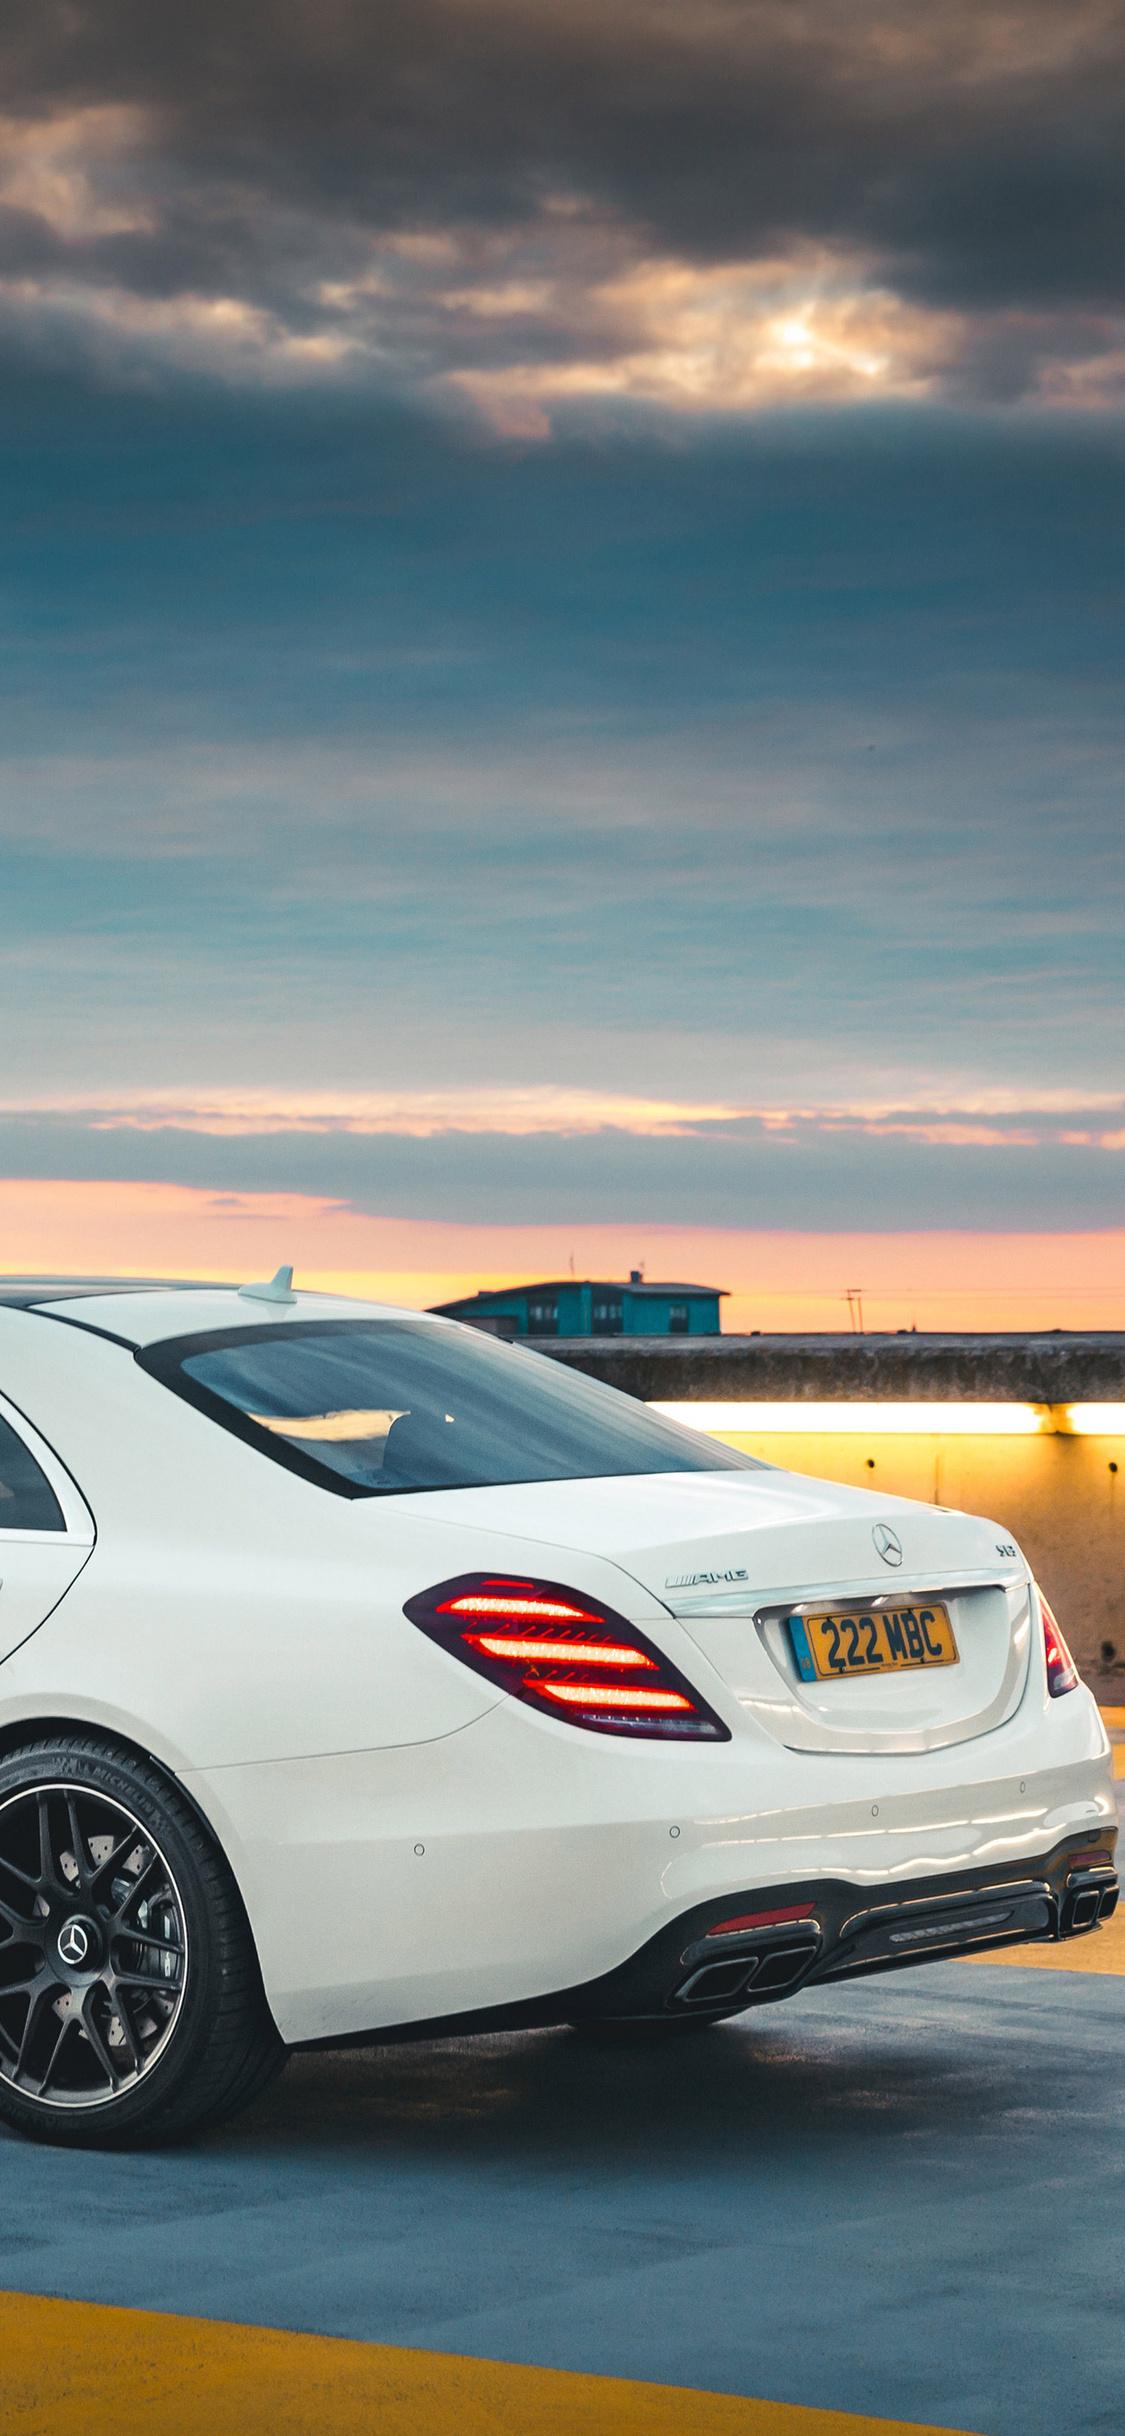 1125x2436 2018 Mercedes Amg S63 Iphone Xsiphone 10iphone X